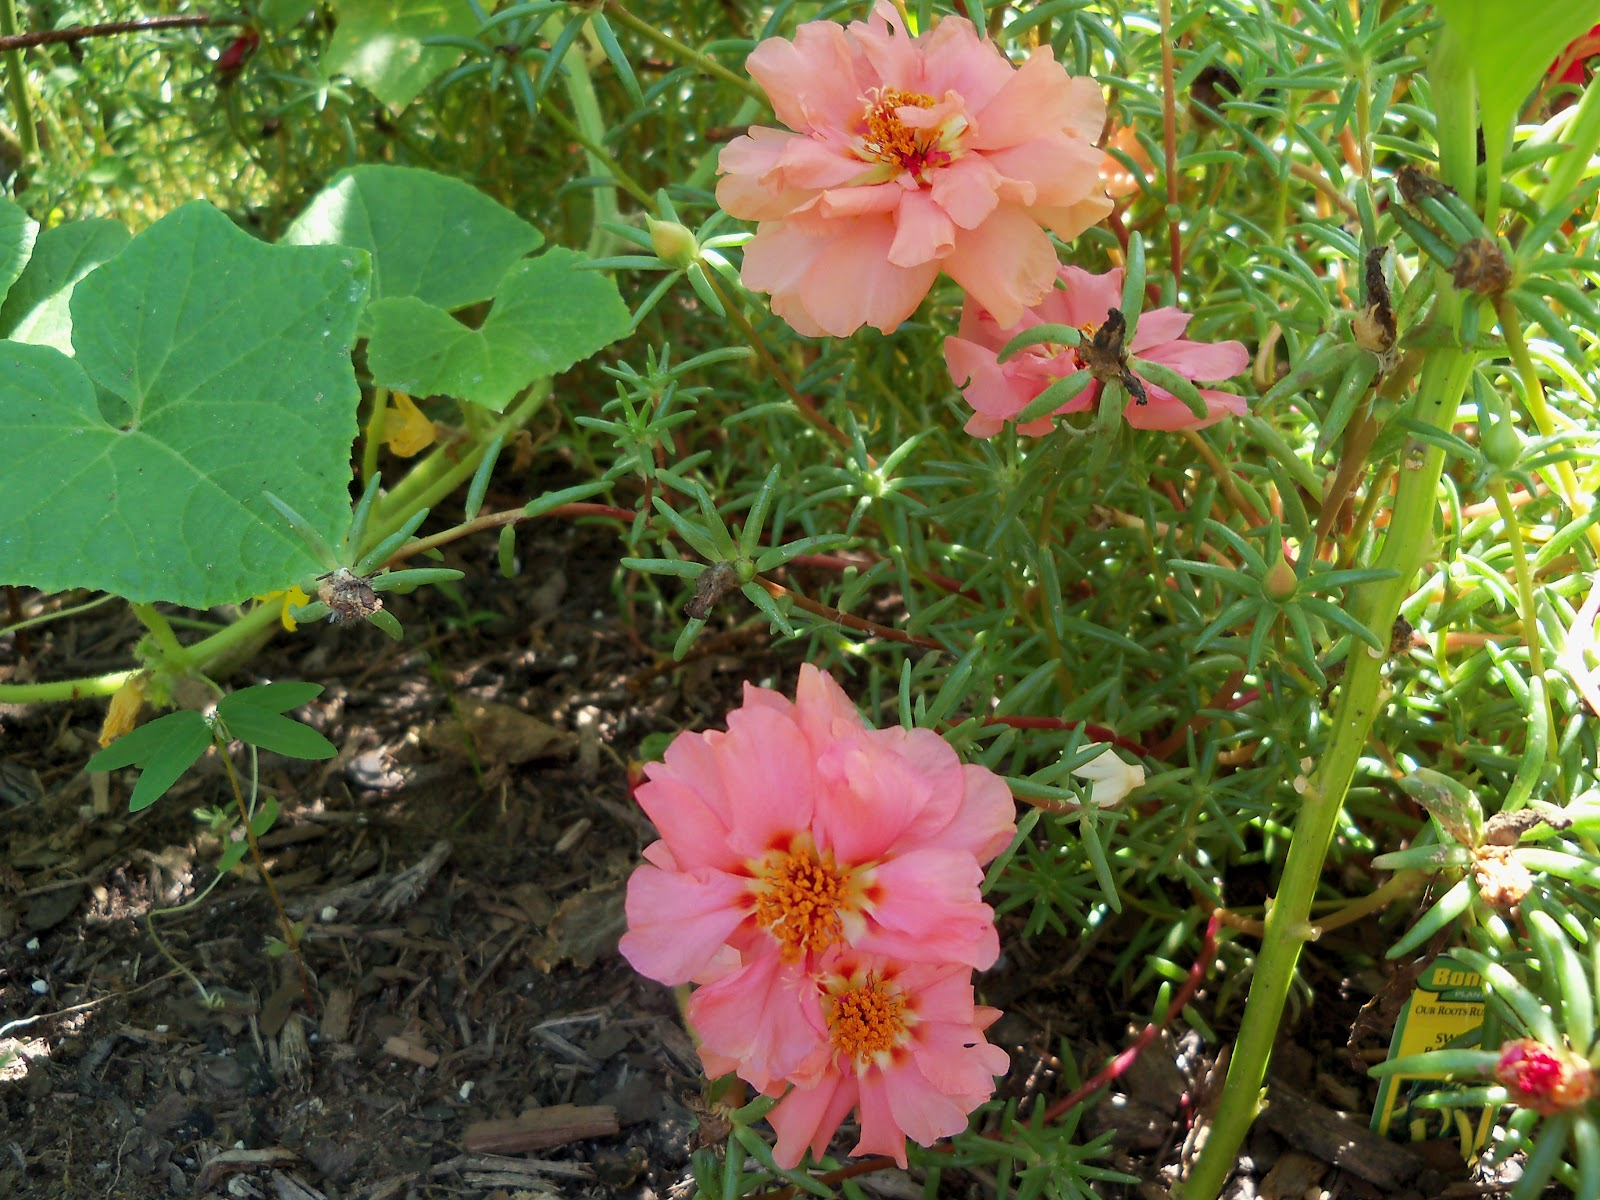 Gardening 2010, Part Three - 101_4394.JPG